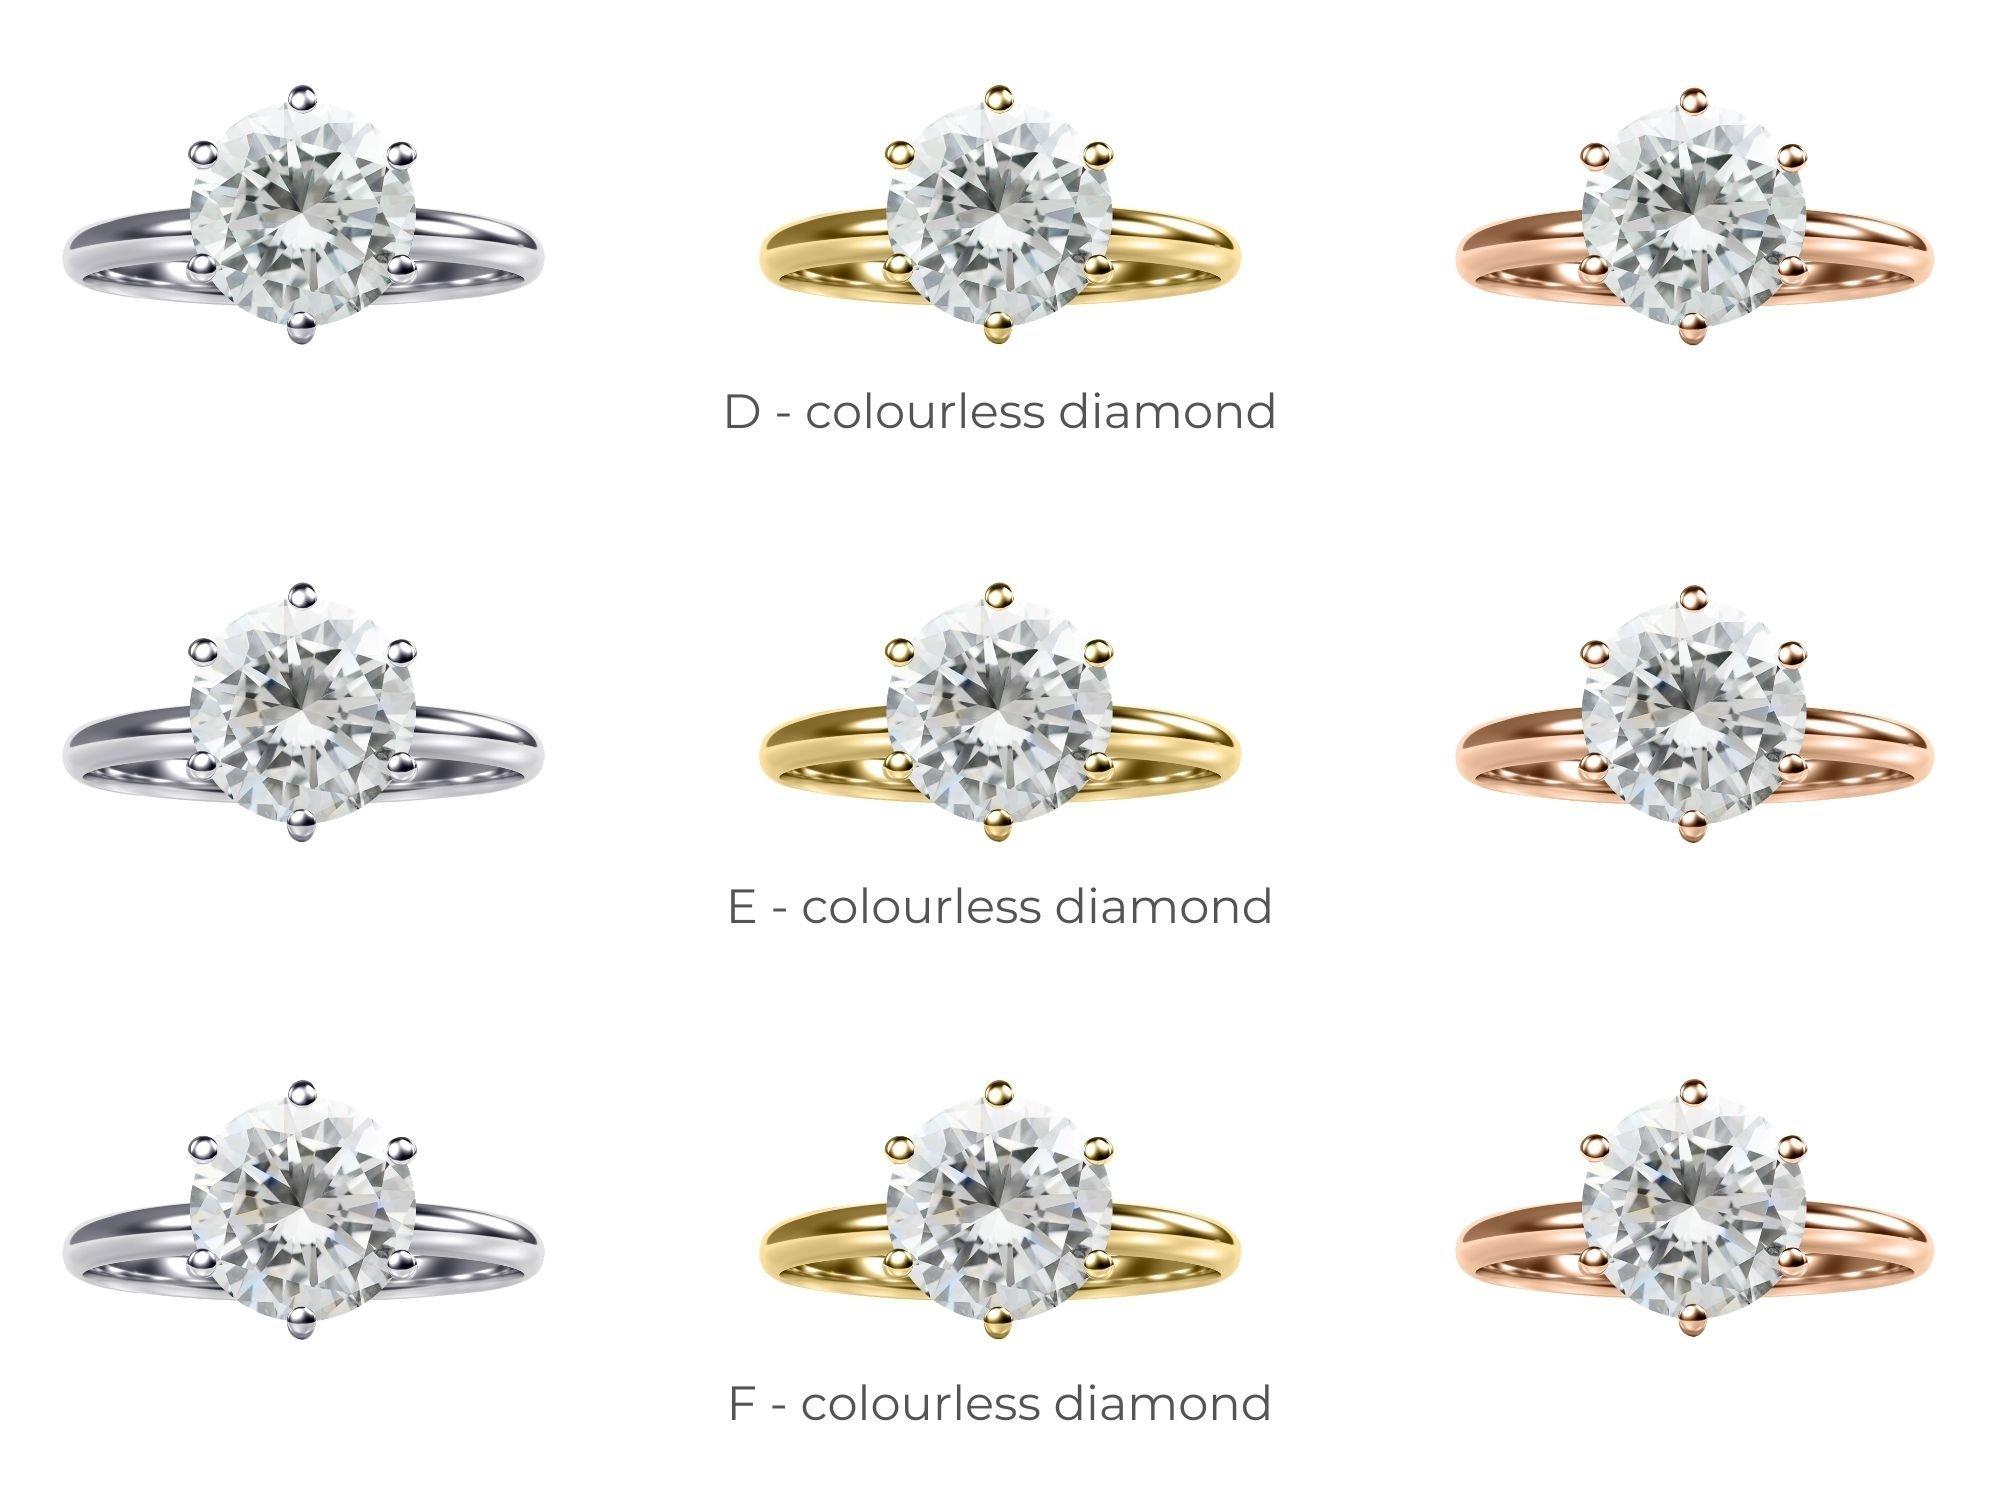 Comparison Of Colourless Diamonds In Different Metals | Diamond Buzz